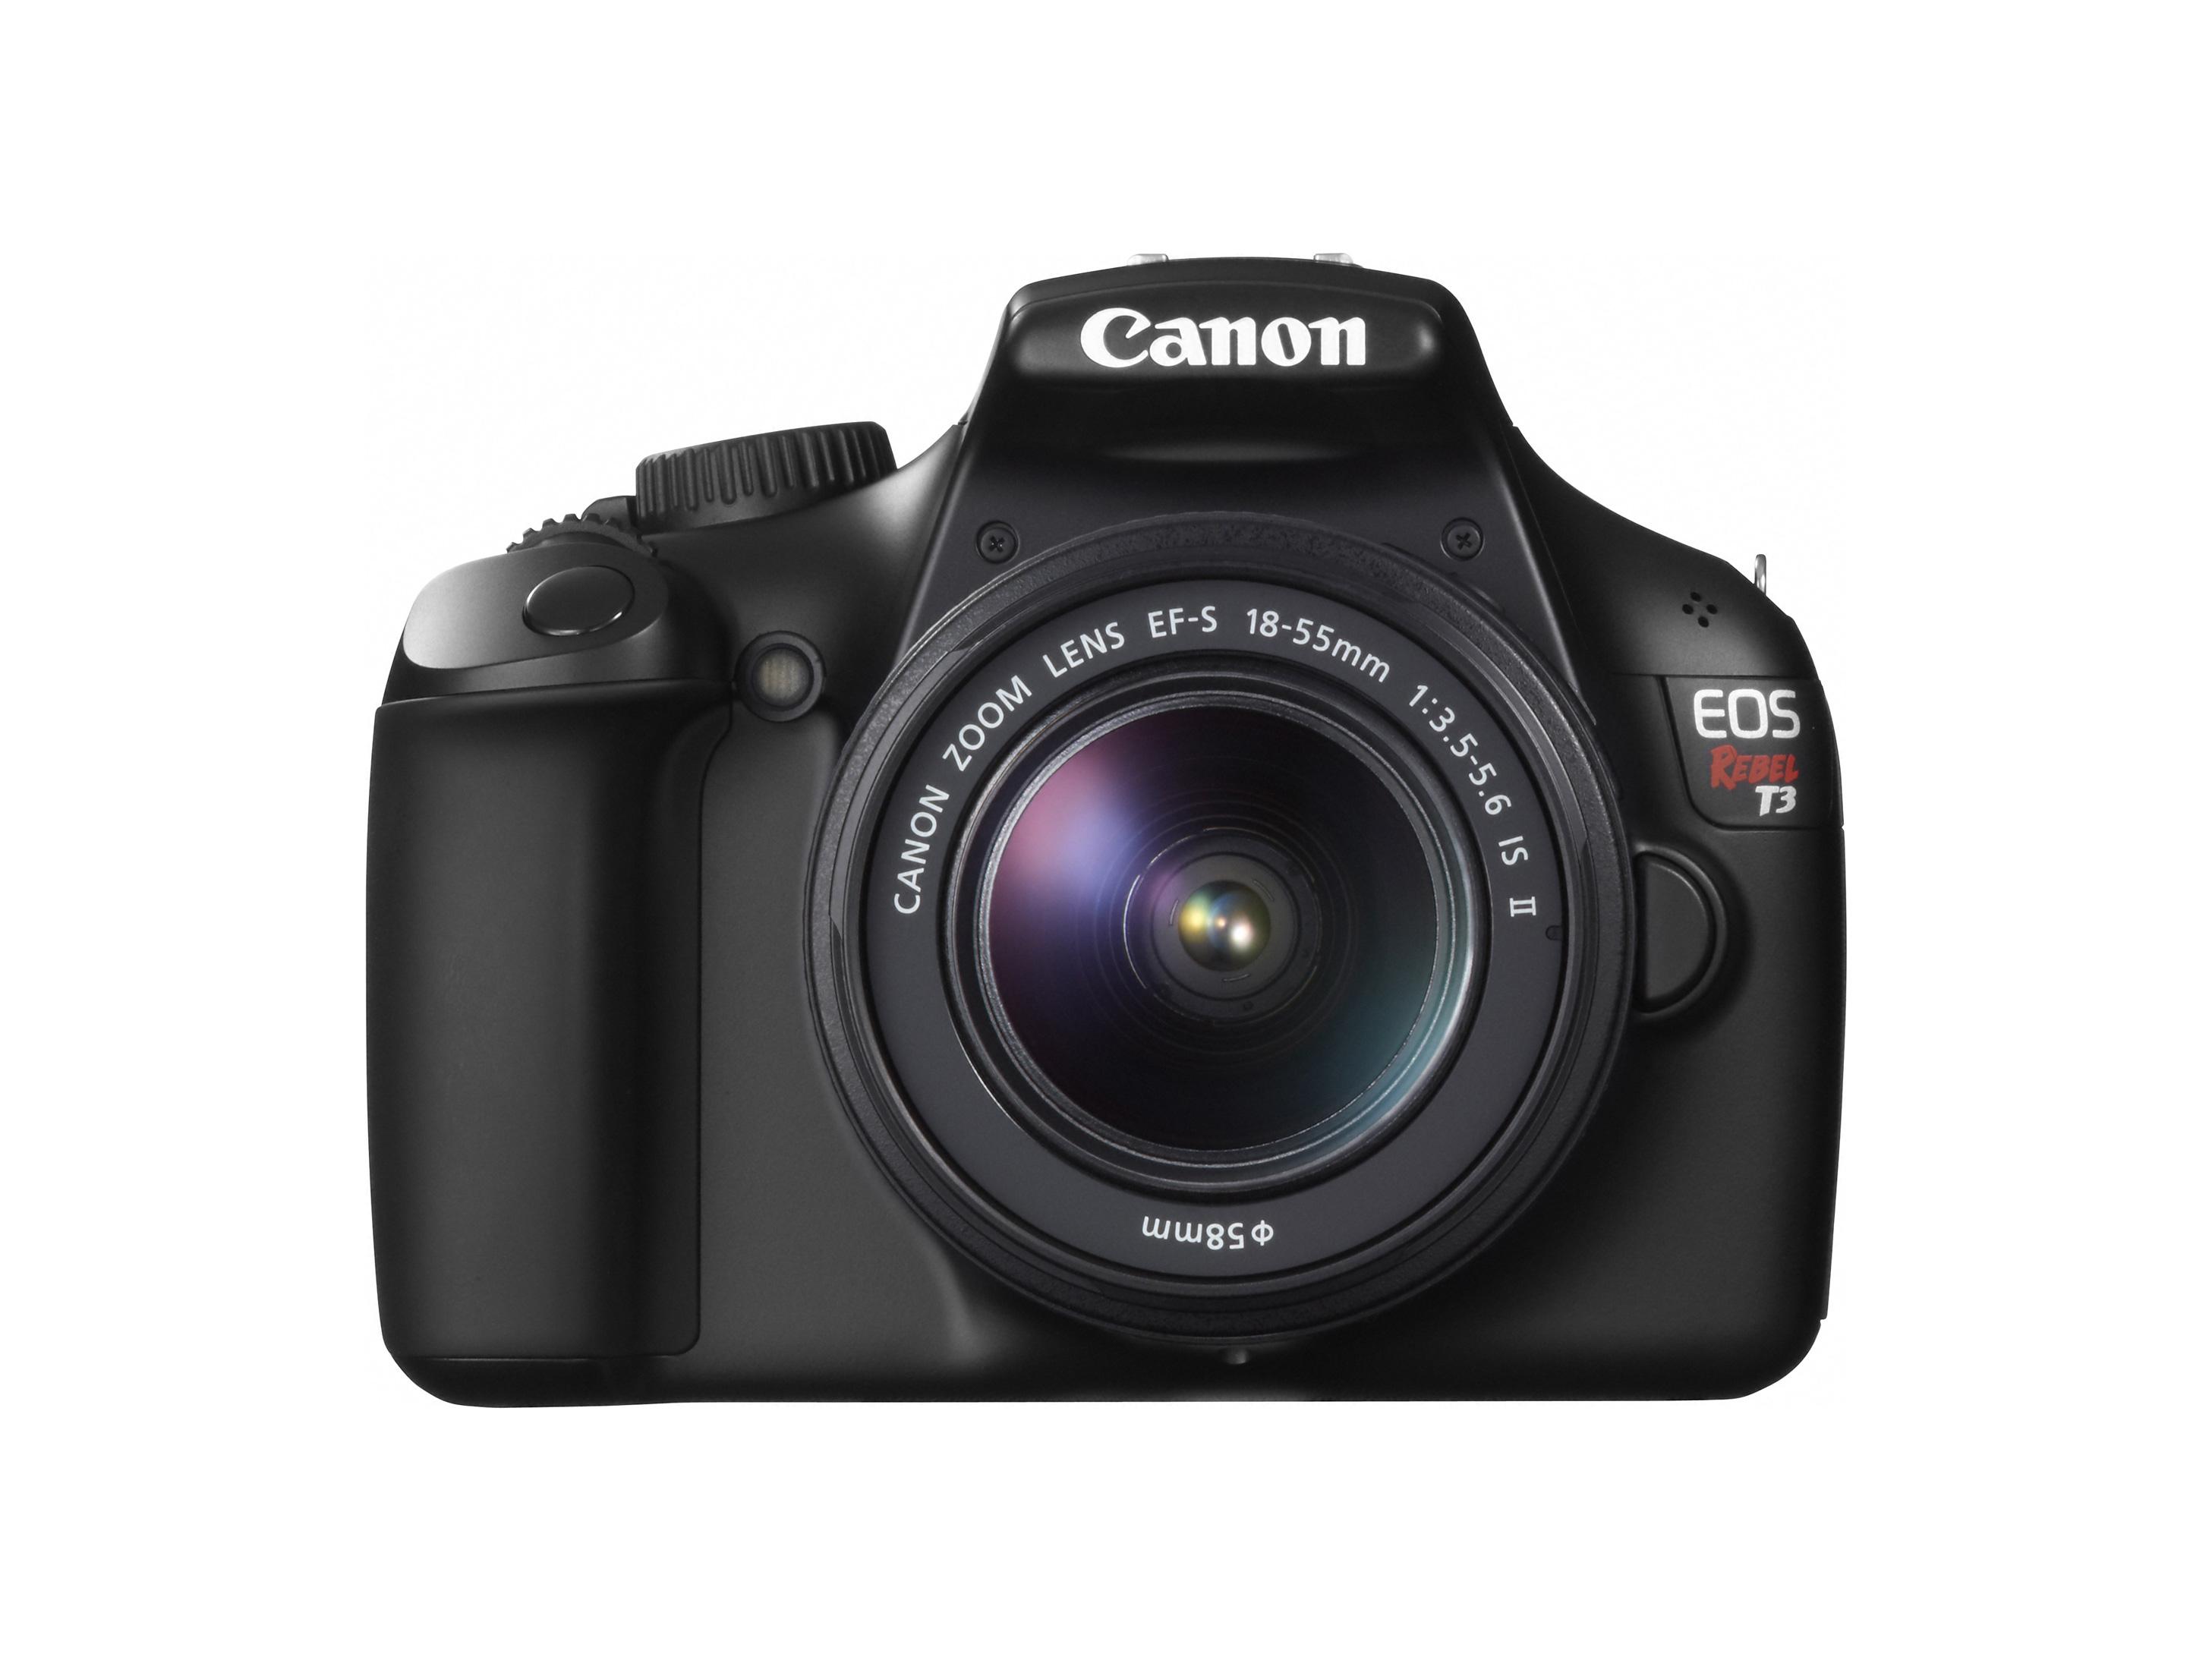 Canon Reveals Eos Rebel T3i And Eos Rebel T3 Digital Slr